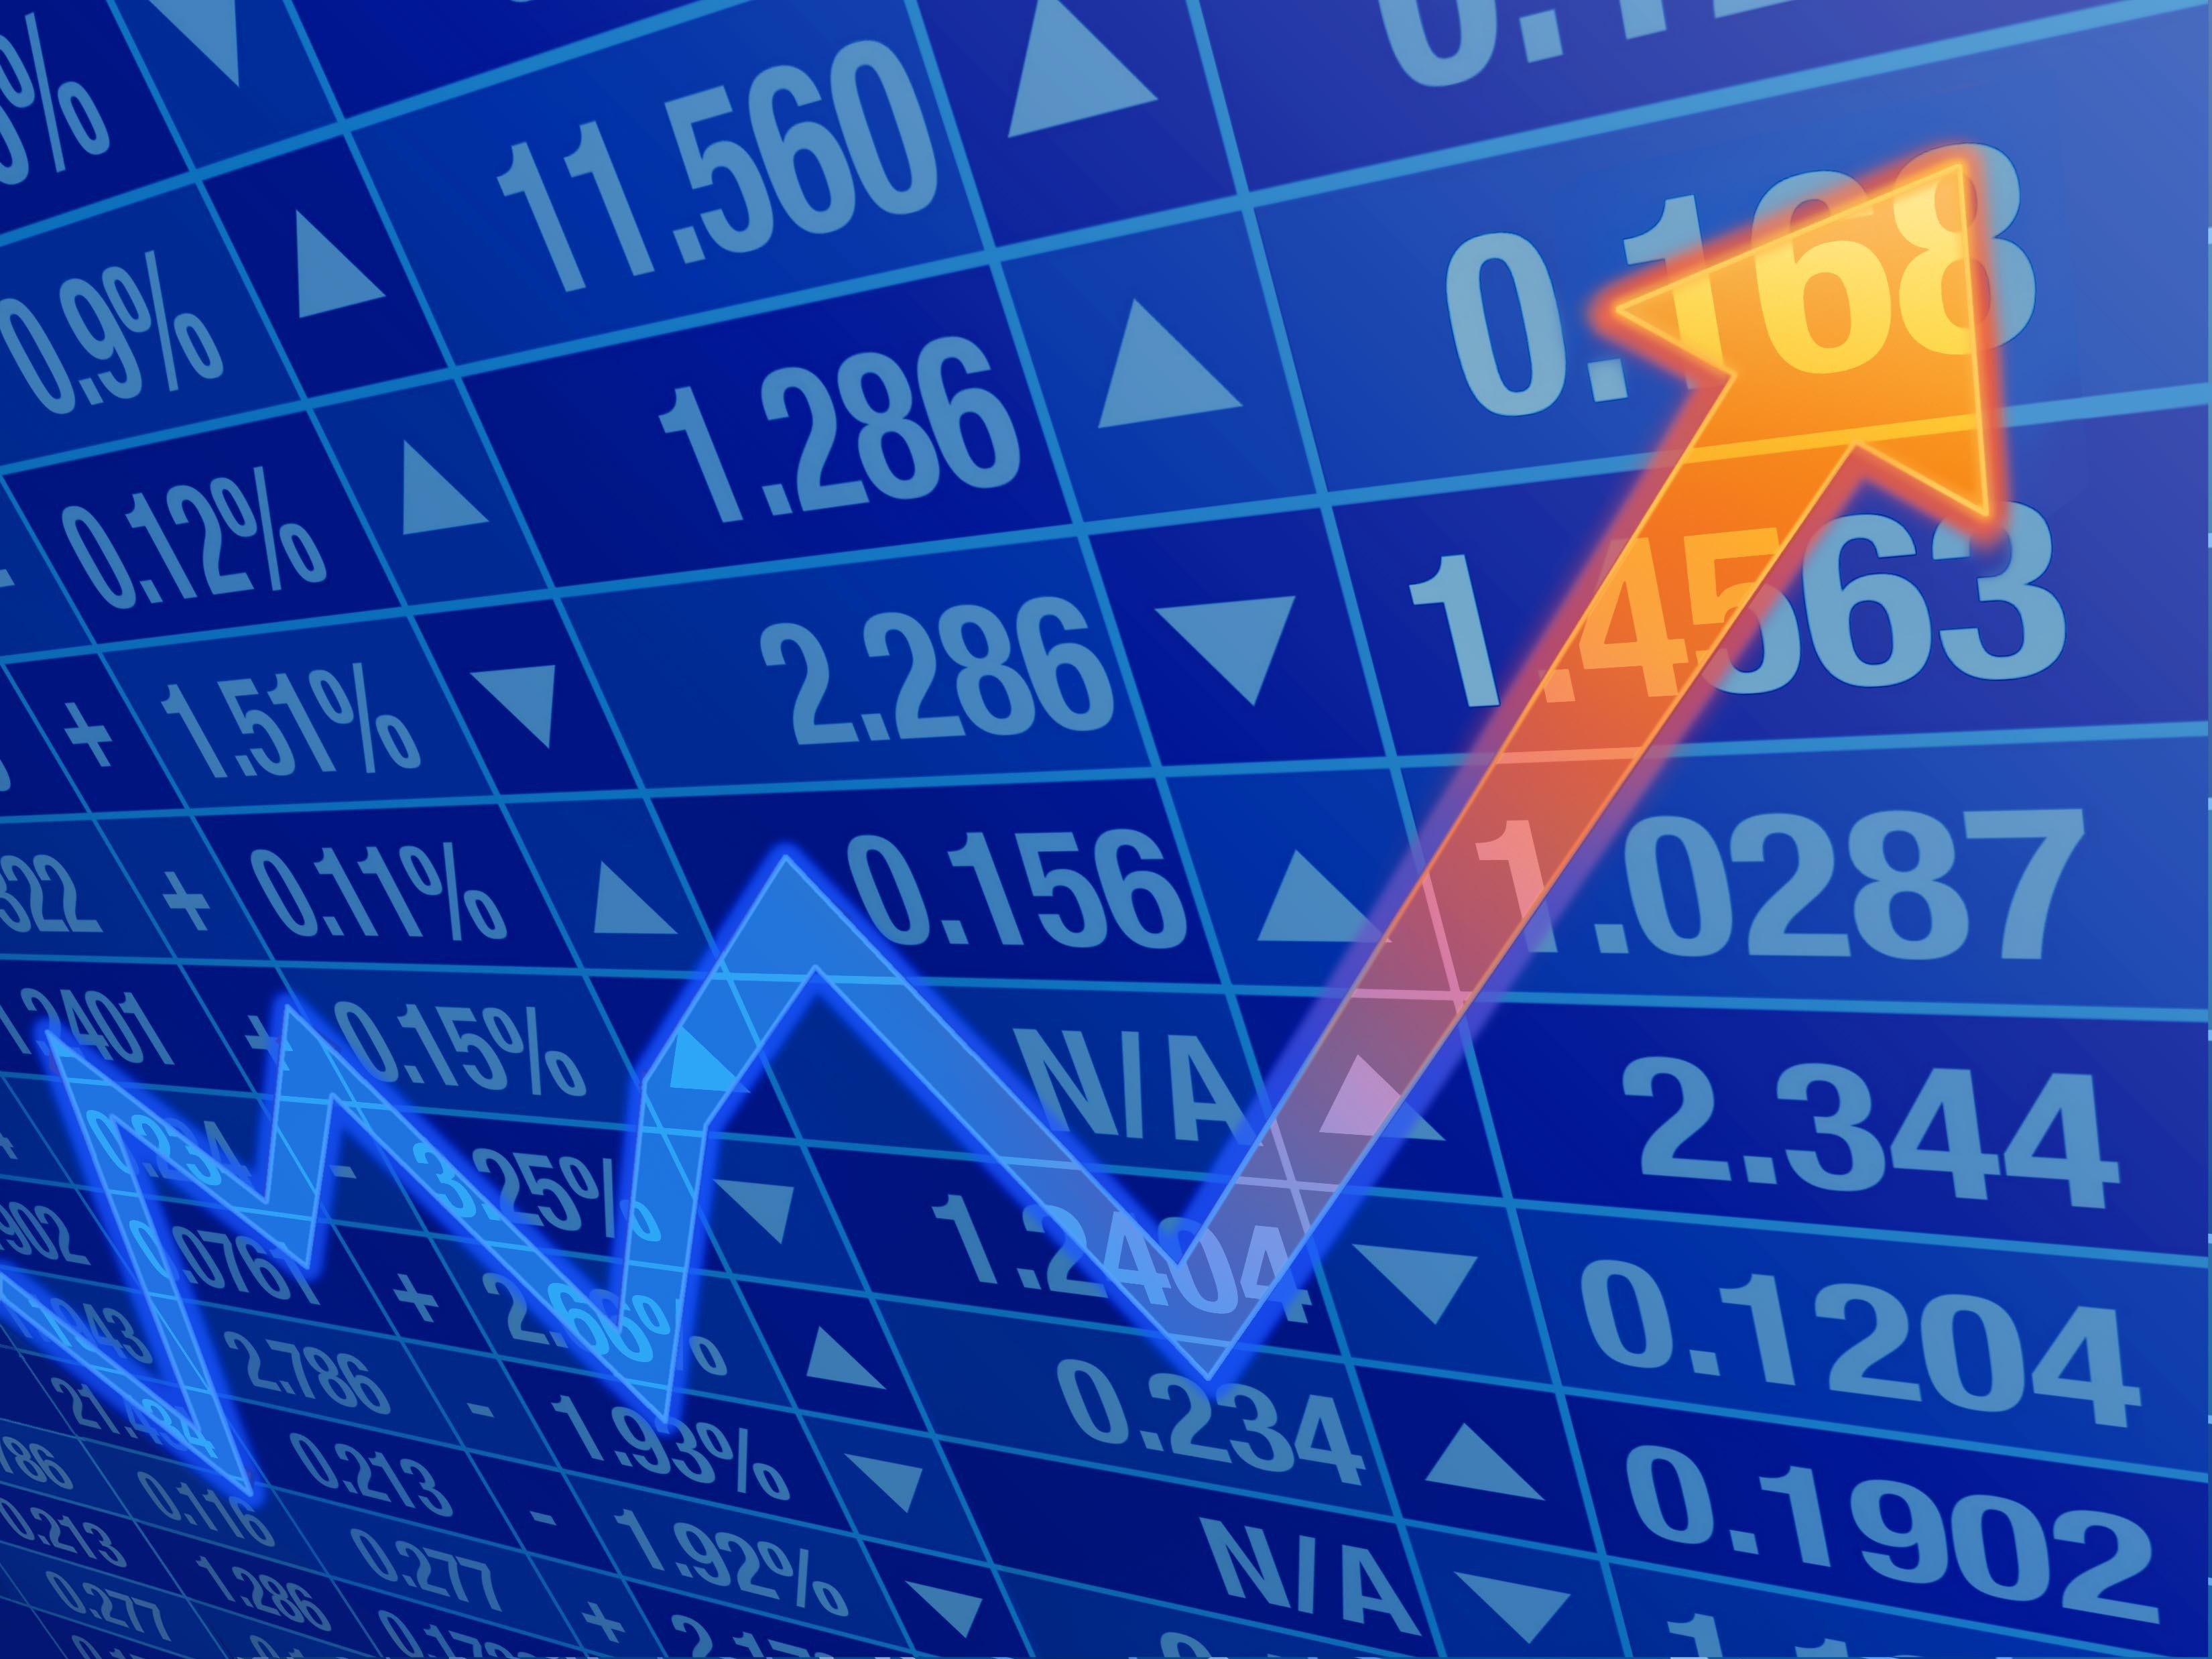 TTCK Hoa Kỳ bật tăng gần 1.5%